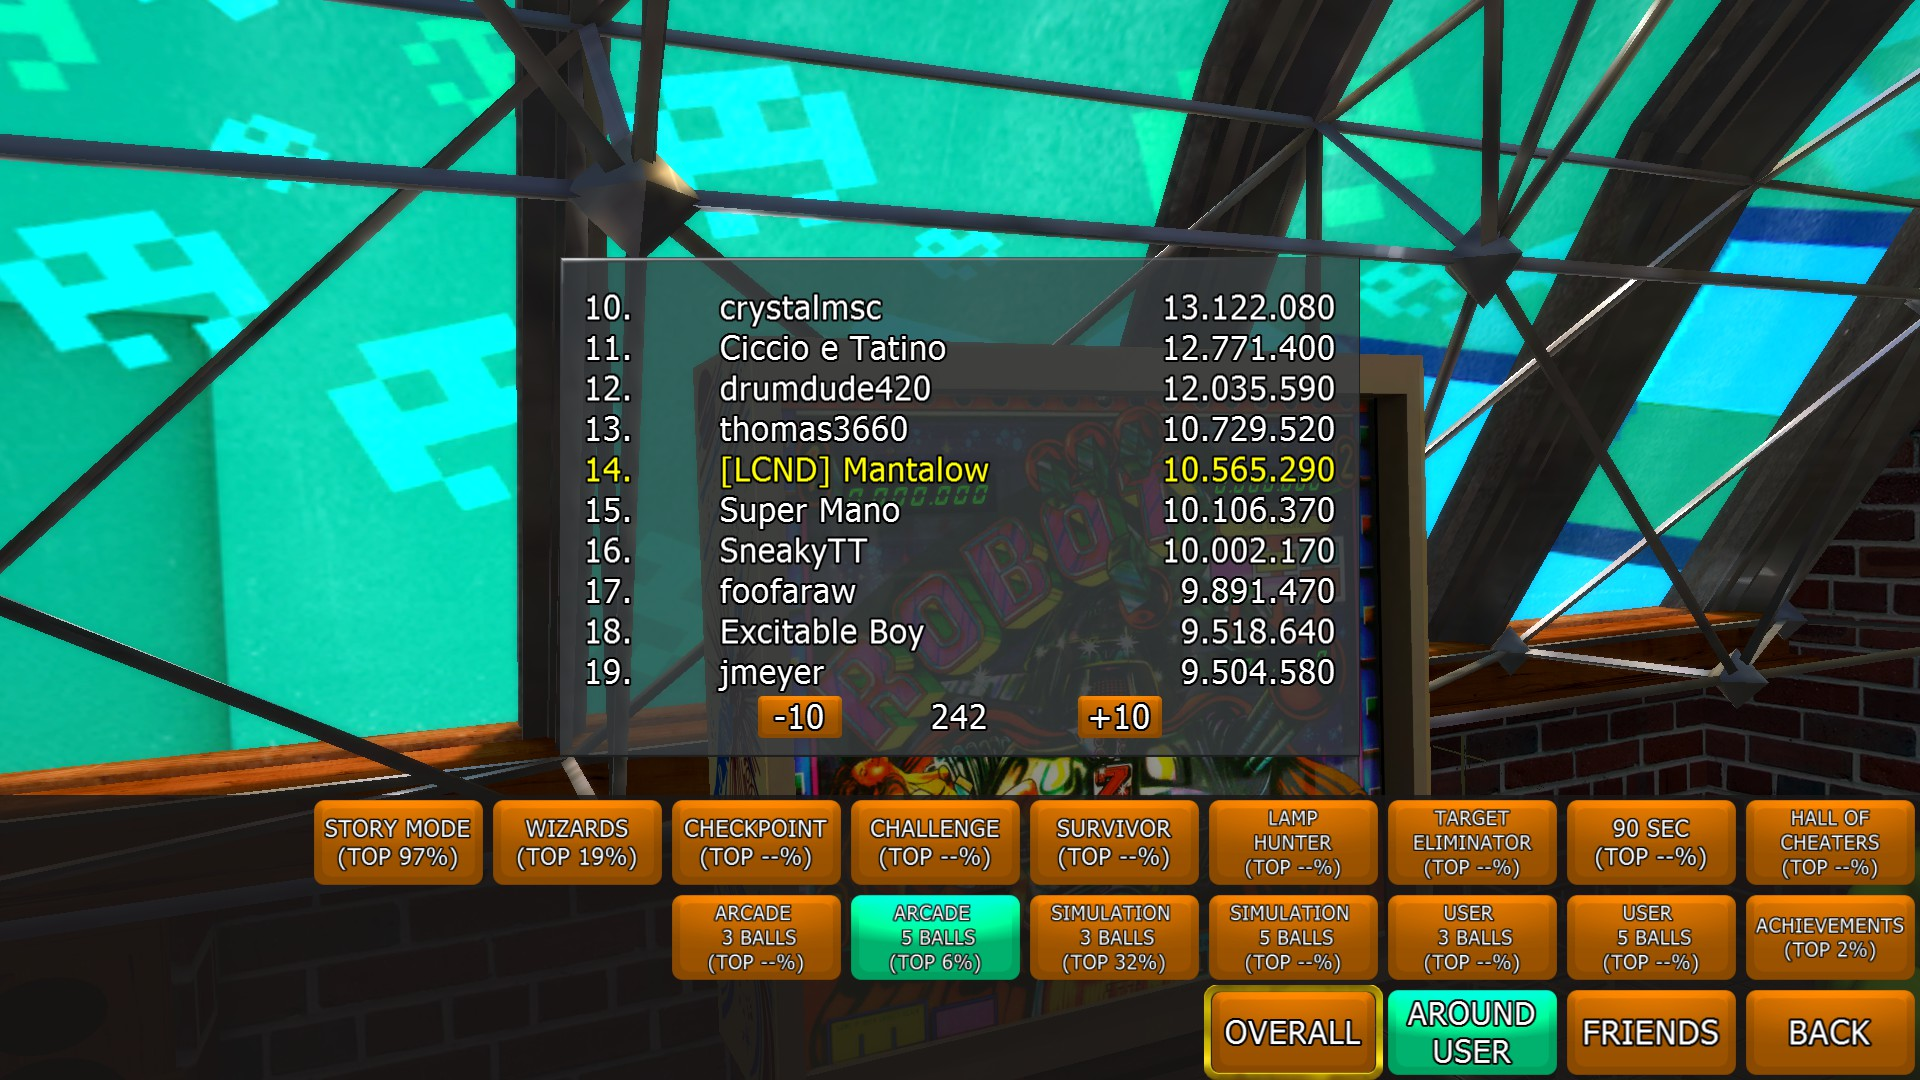 Zaccaria Pinball: Robot [5 balls] 10,565,290 points